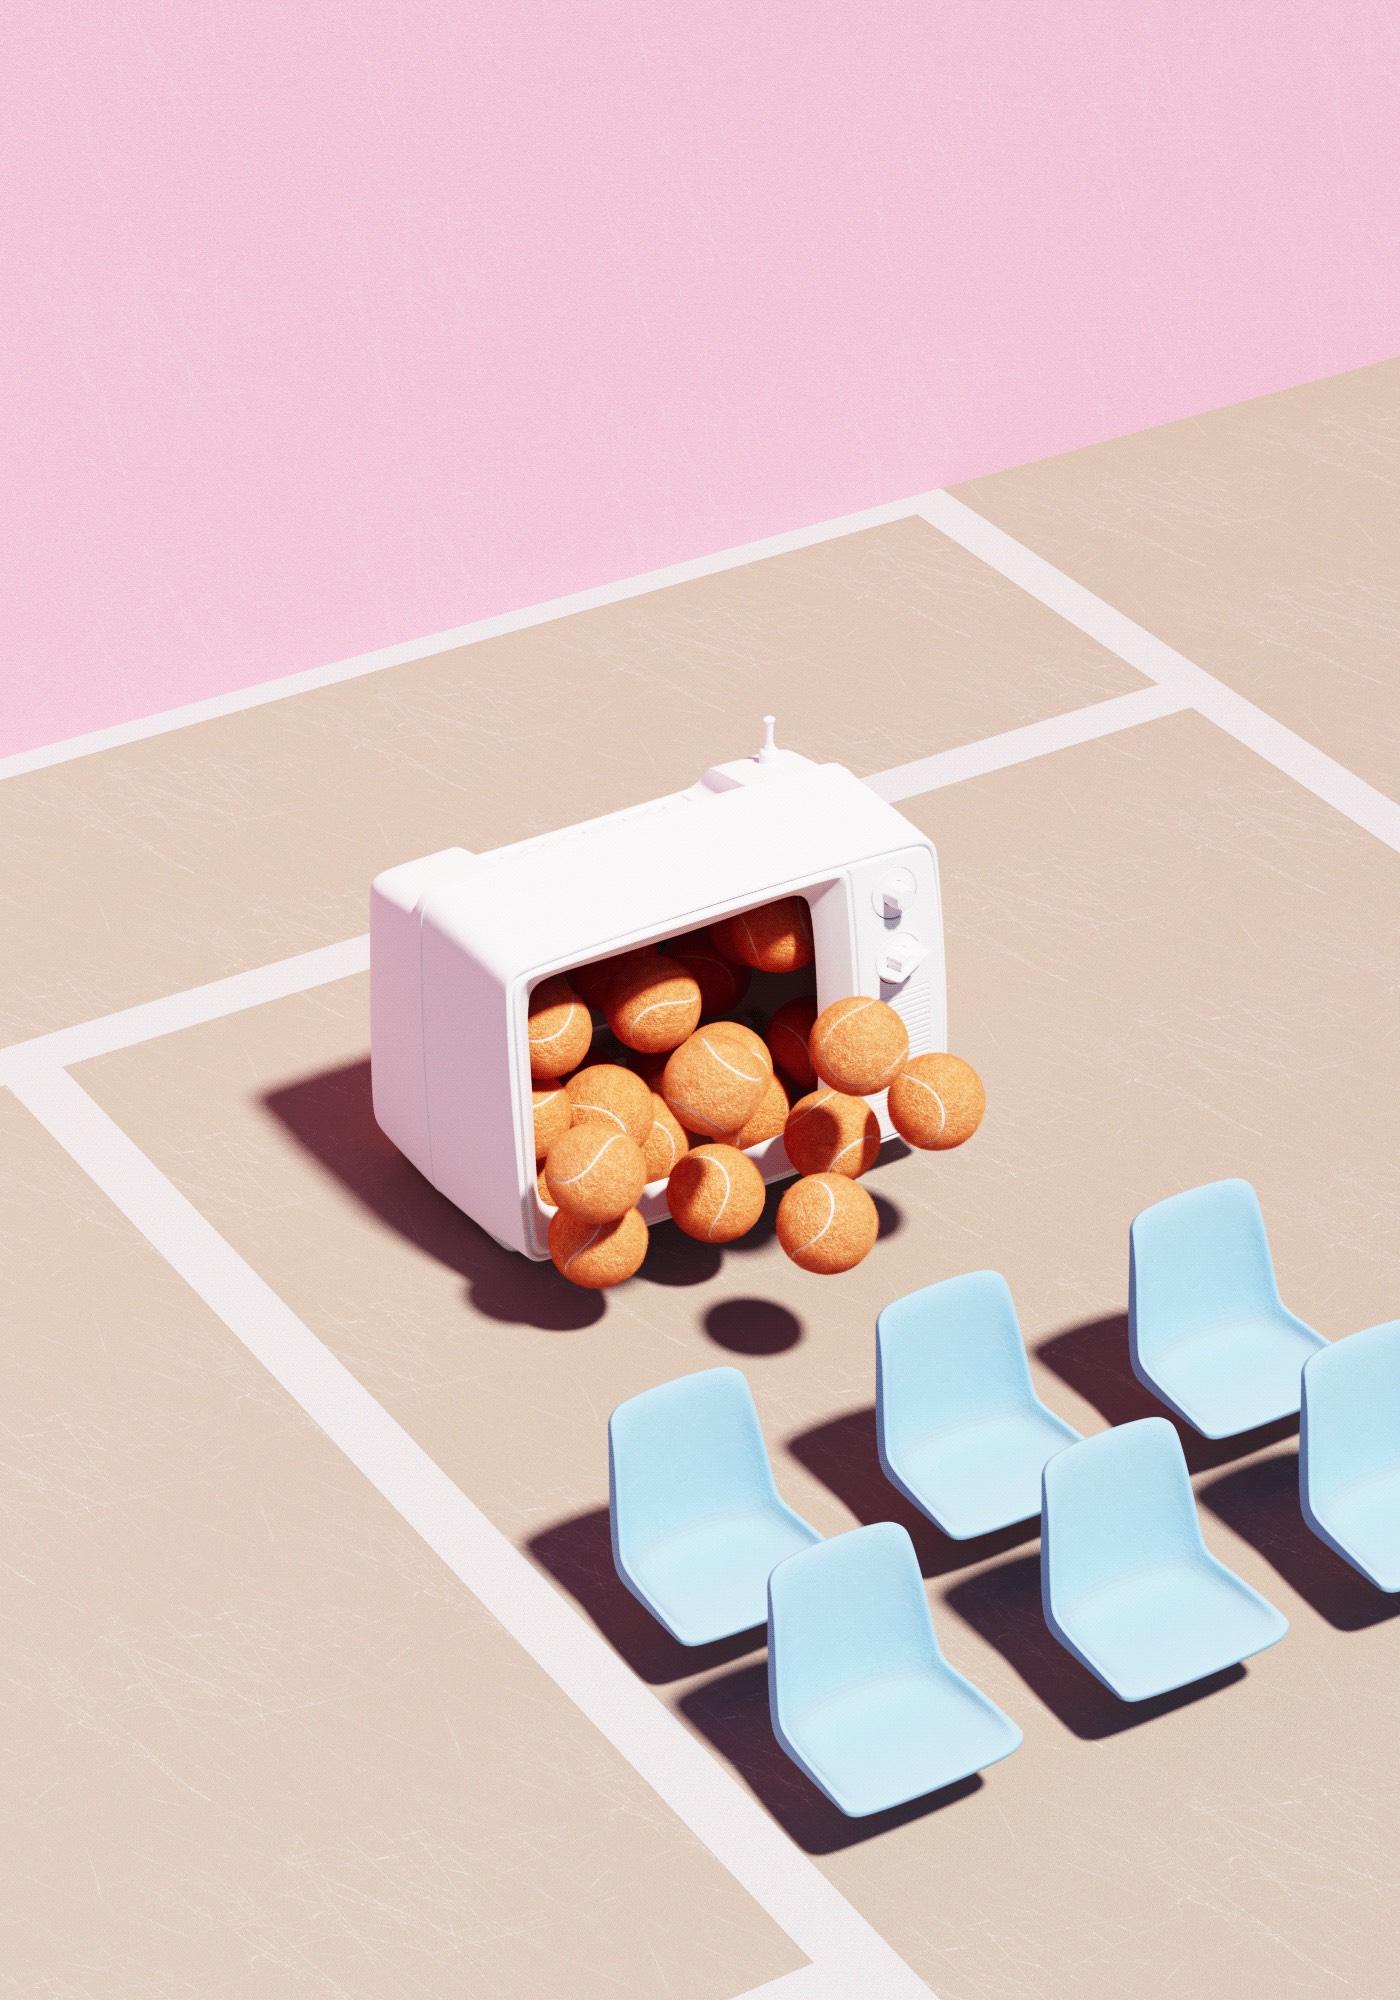 Surreal Tennis Composition with Dreamy Tones – Fubiz Media Design